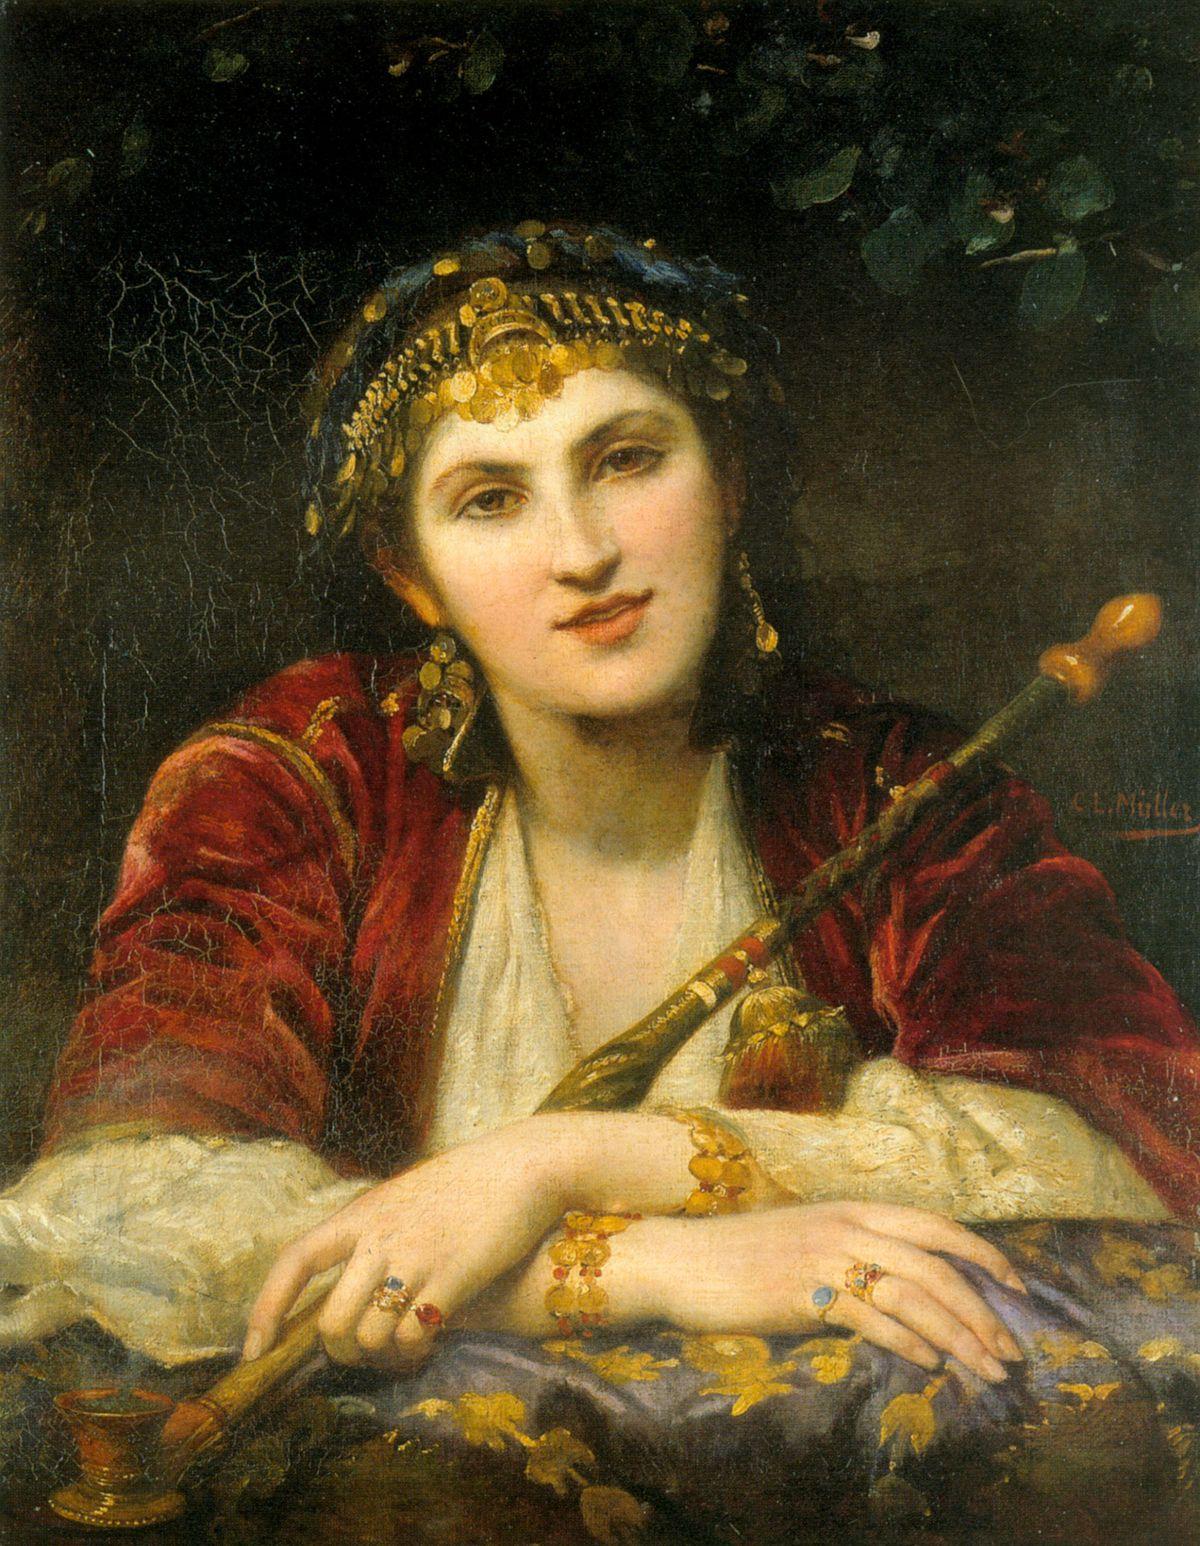 La belle orientale by Charles Louis Lucien Muller